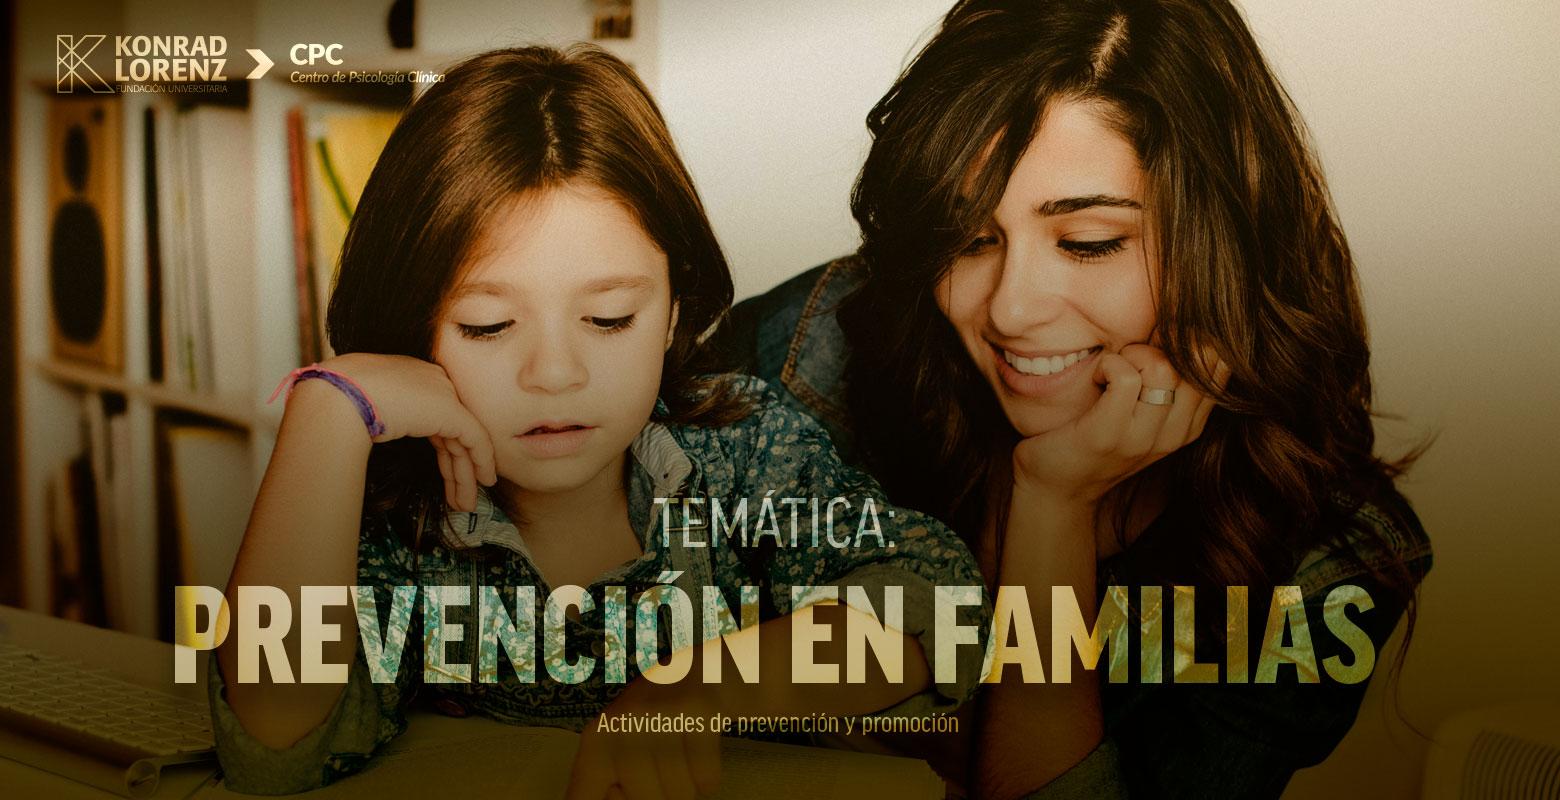 Temática: Prevención en familias